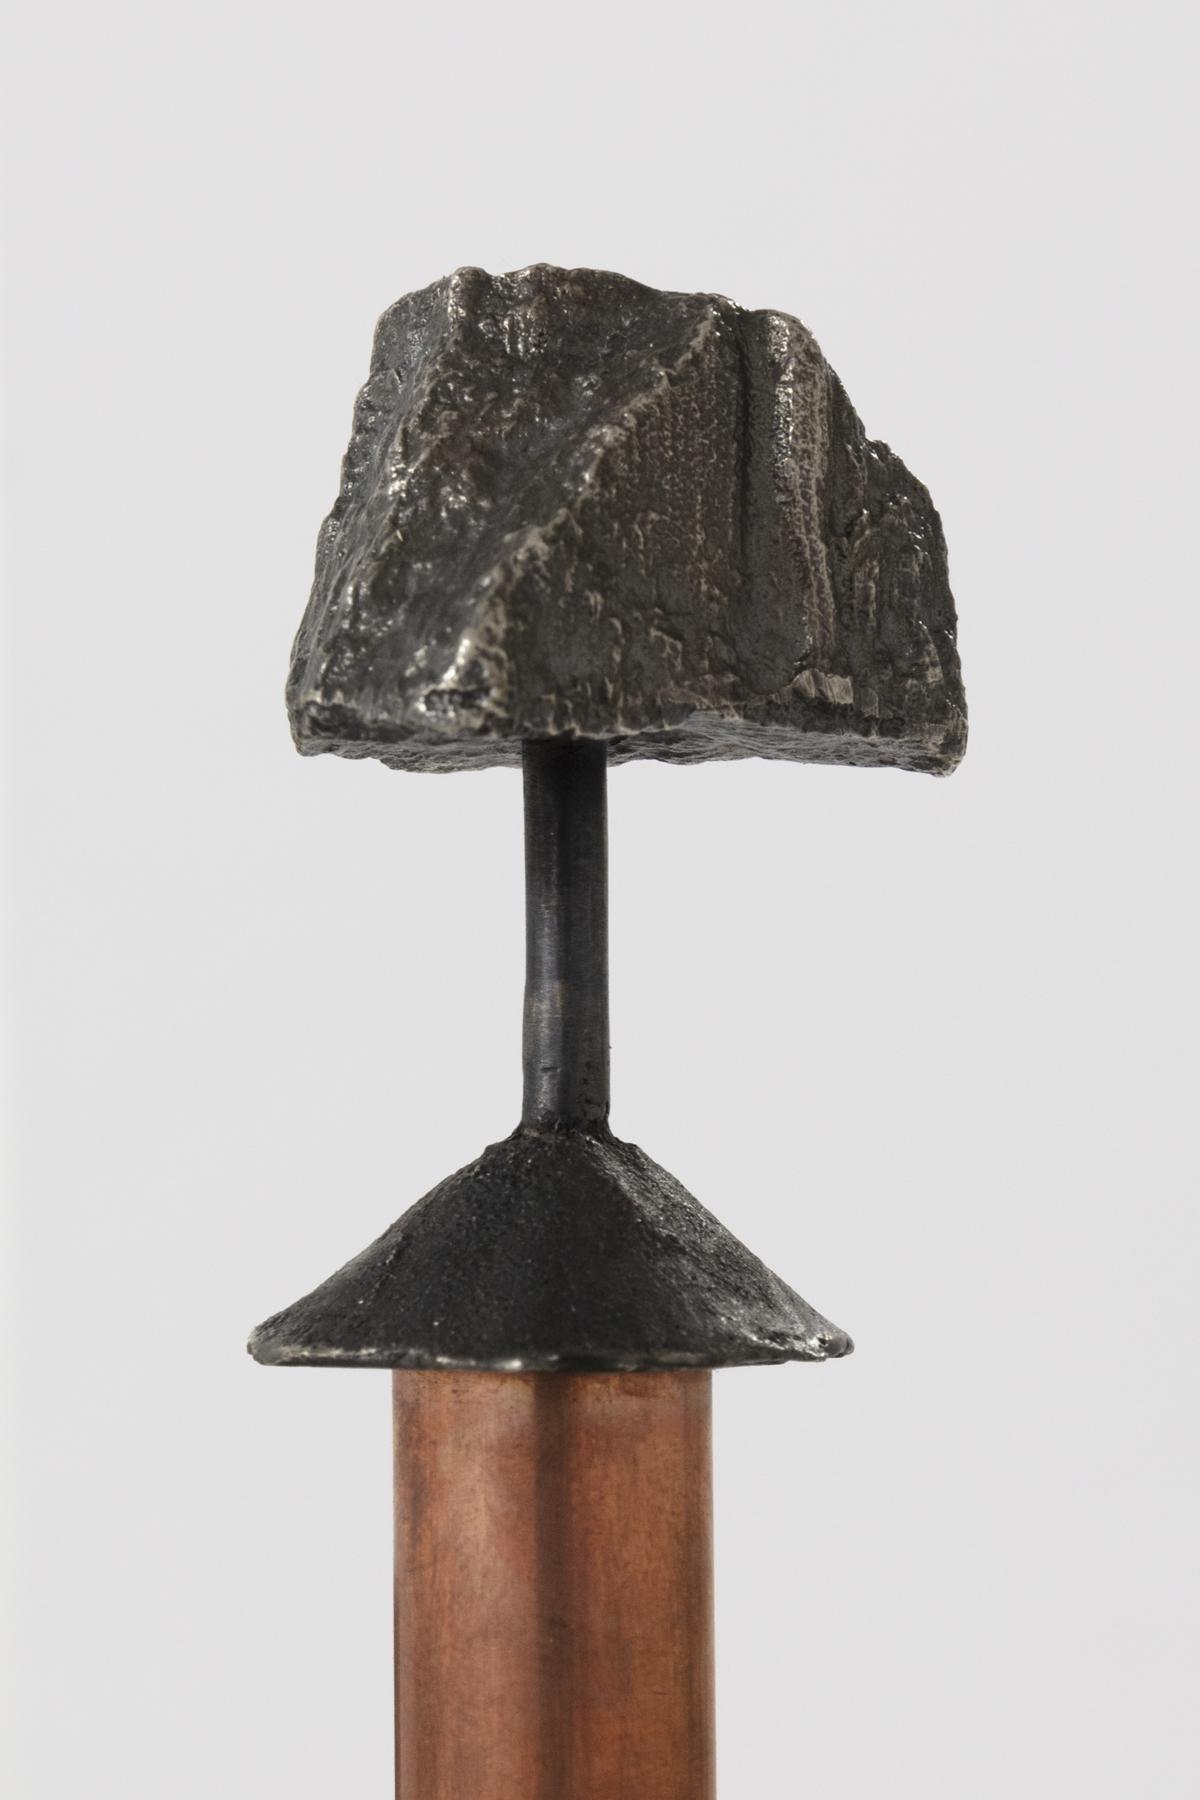 (Detal) Berget /The Montain, 2020 Copper, granite, sterling silver 925 183 cm, basen: ca 20 x 20 cm